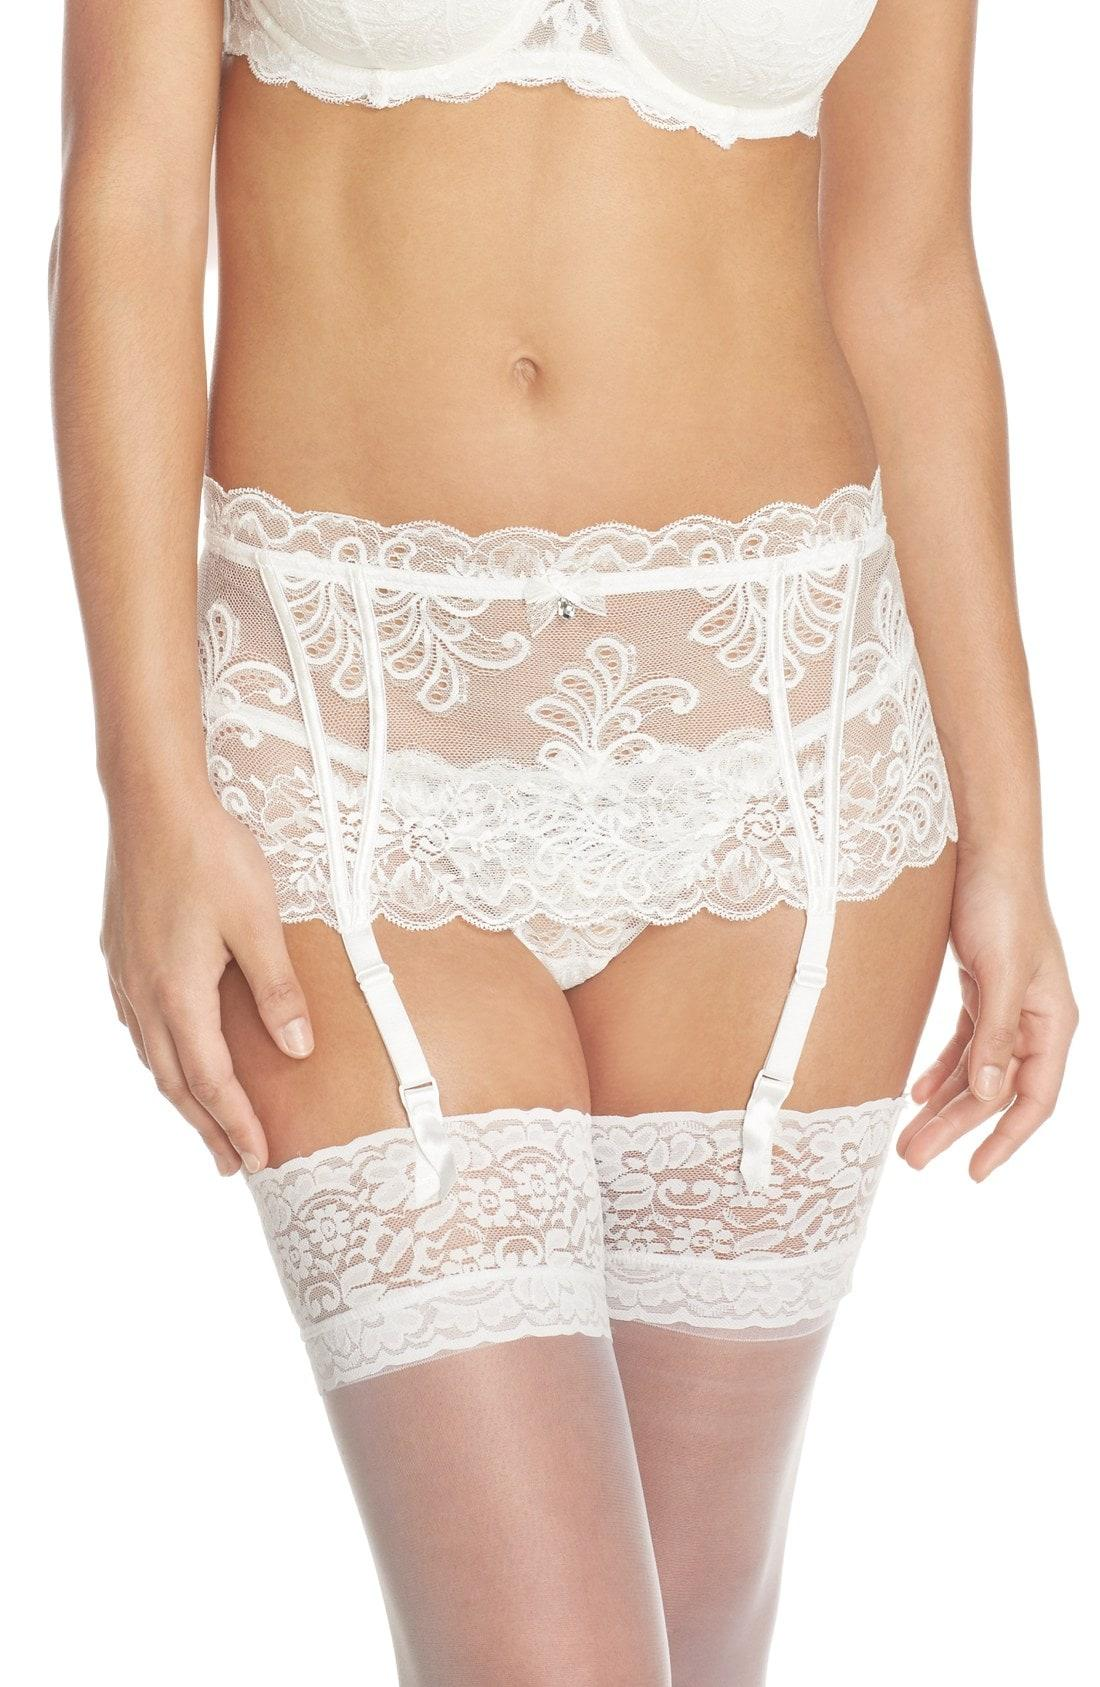 959685cd36e Lyst - Le Mystere Le Mysere  sophia  Lace Garter Belt in White